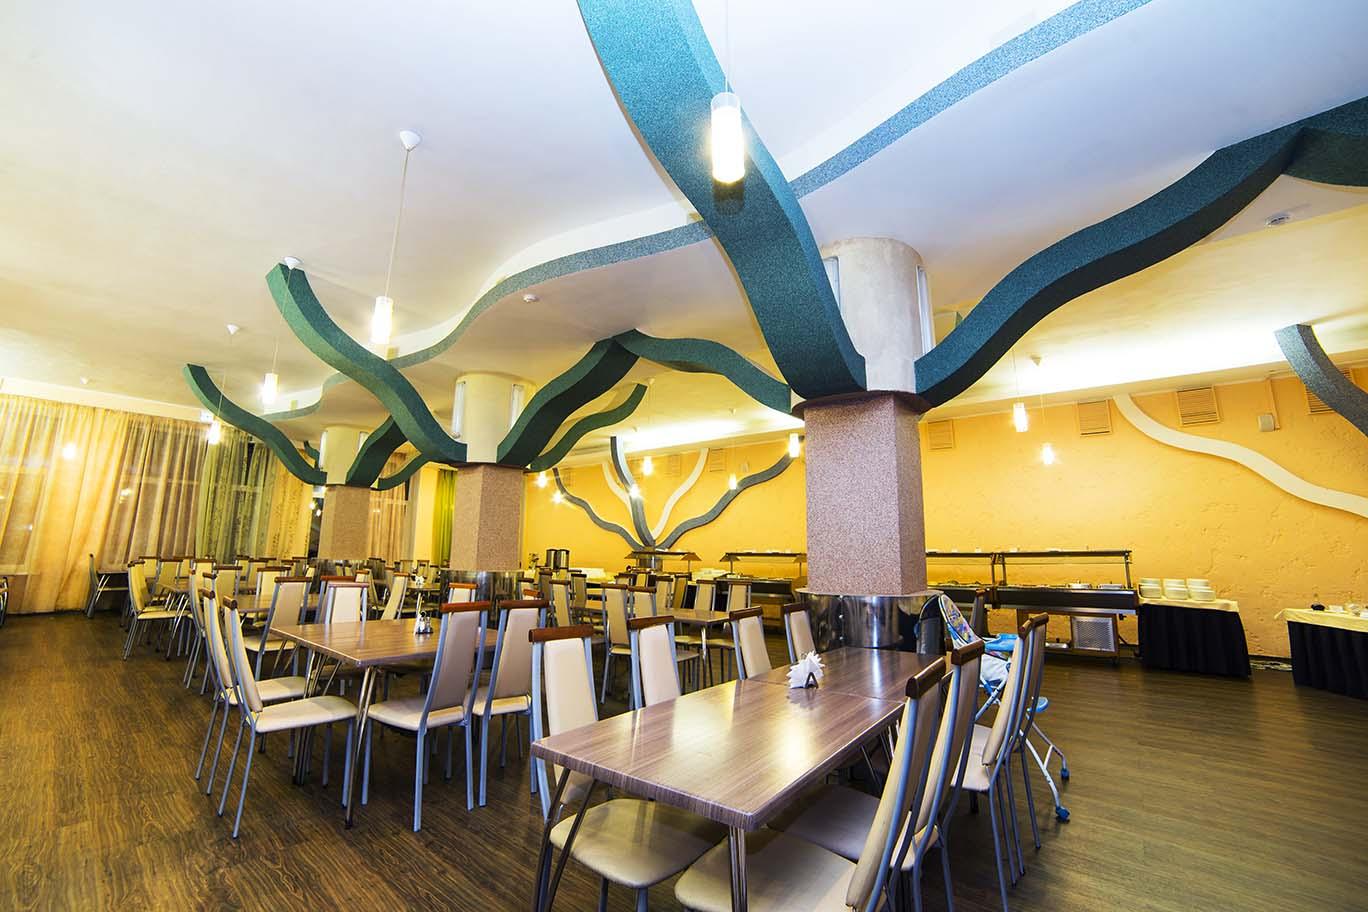 Ресторан Трапезная